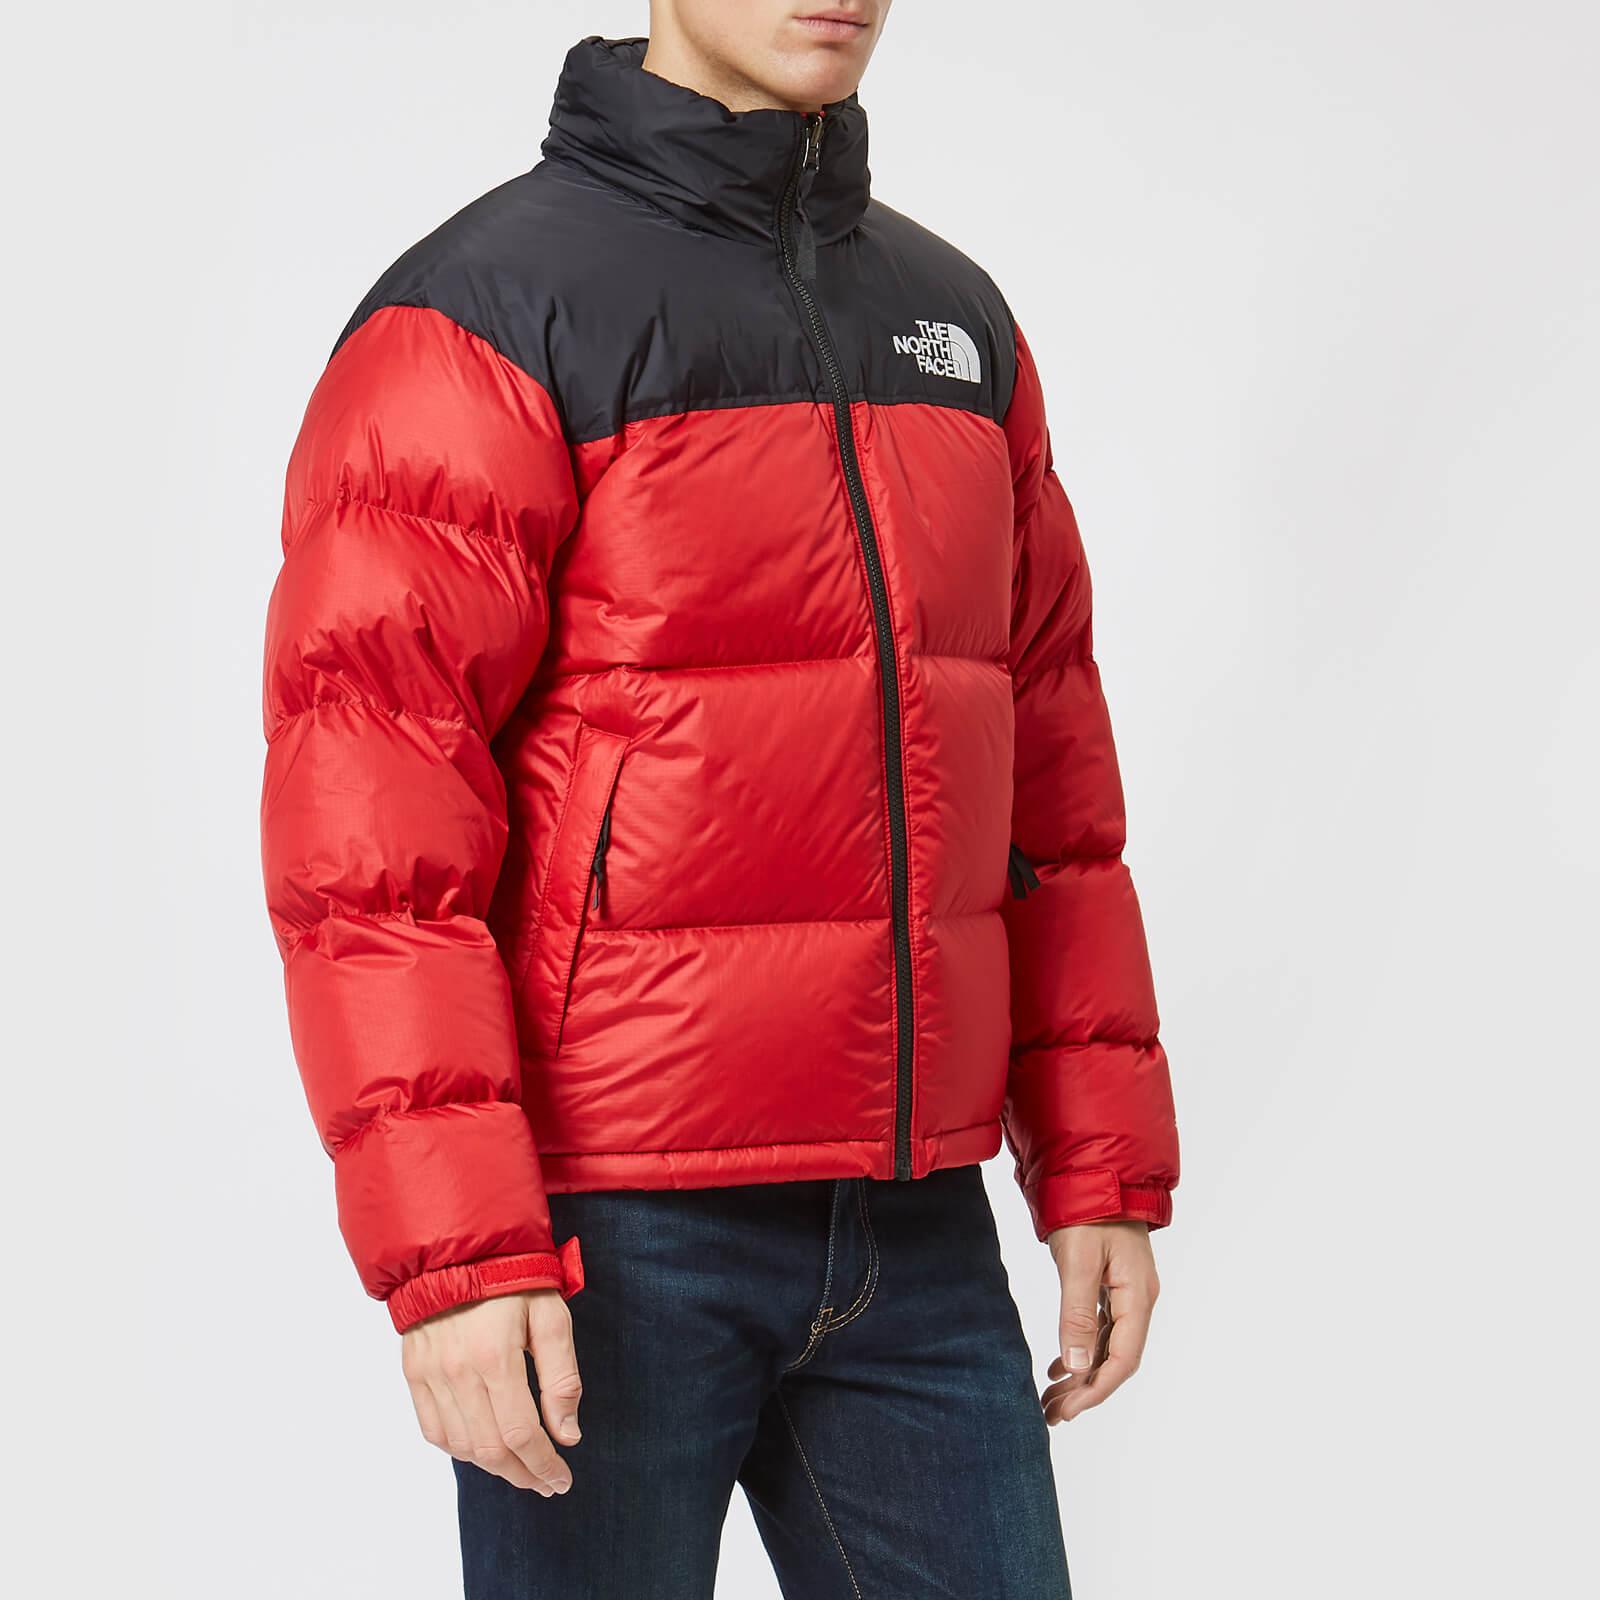 The North Face M 1996 Rto Nptse Jkt Tnf Red XL: